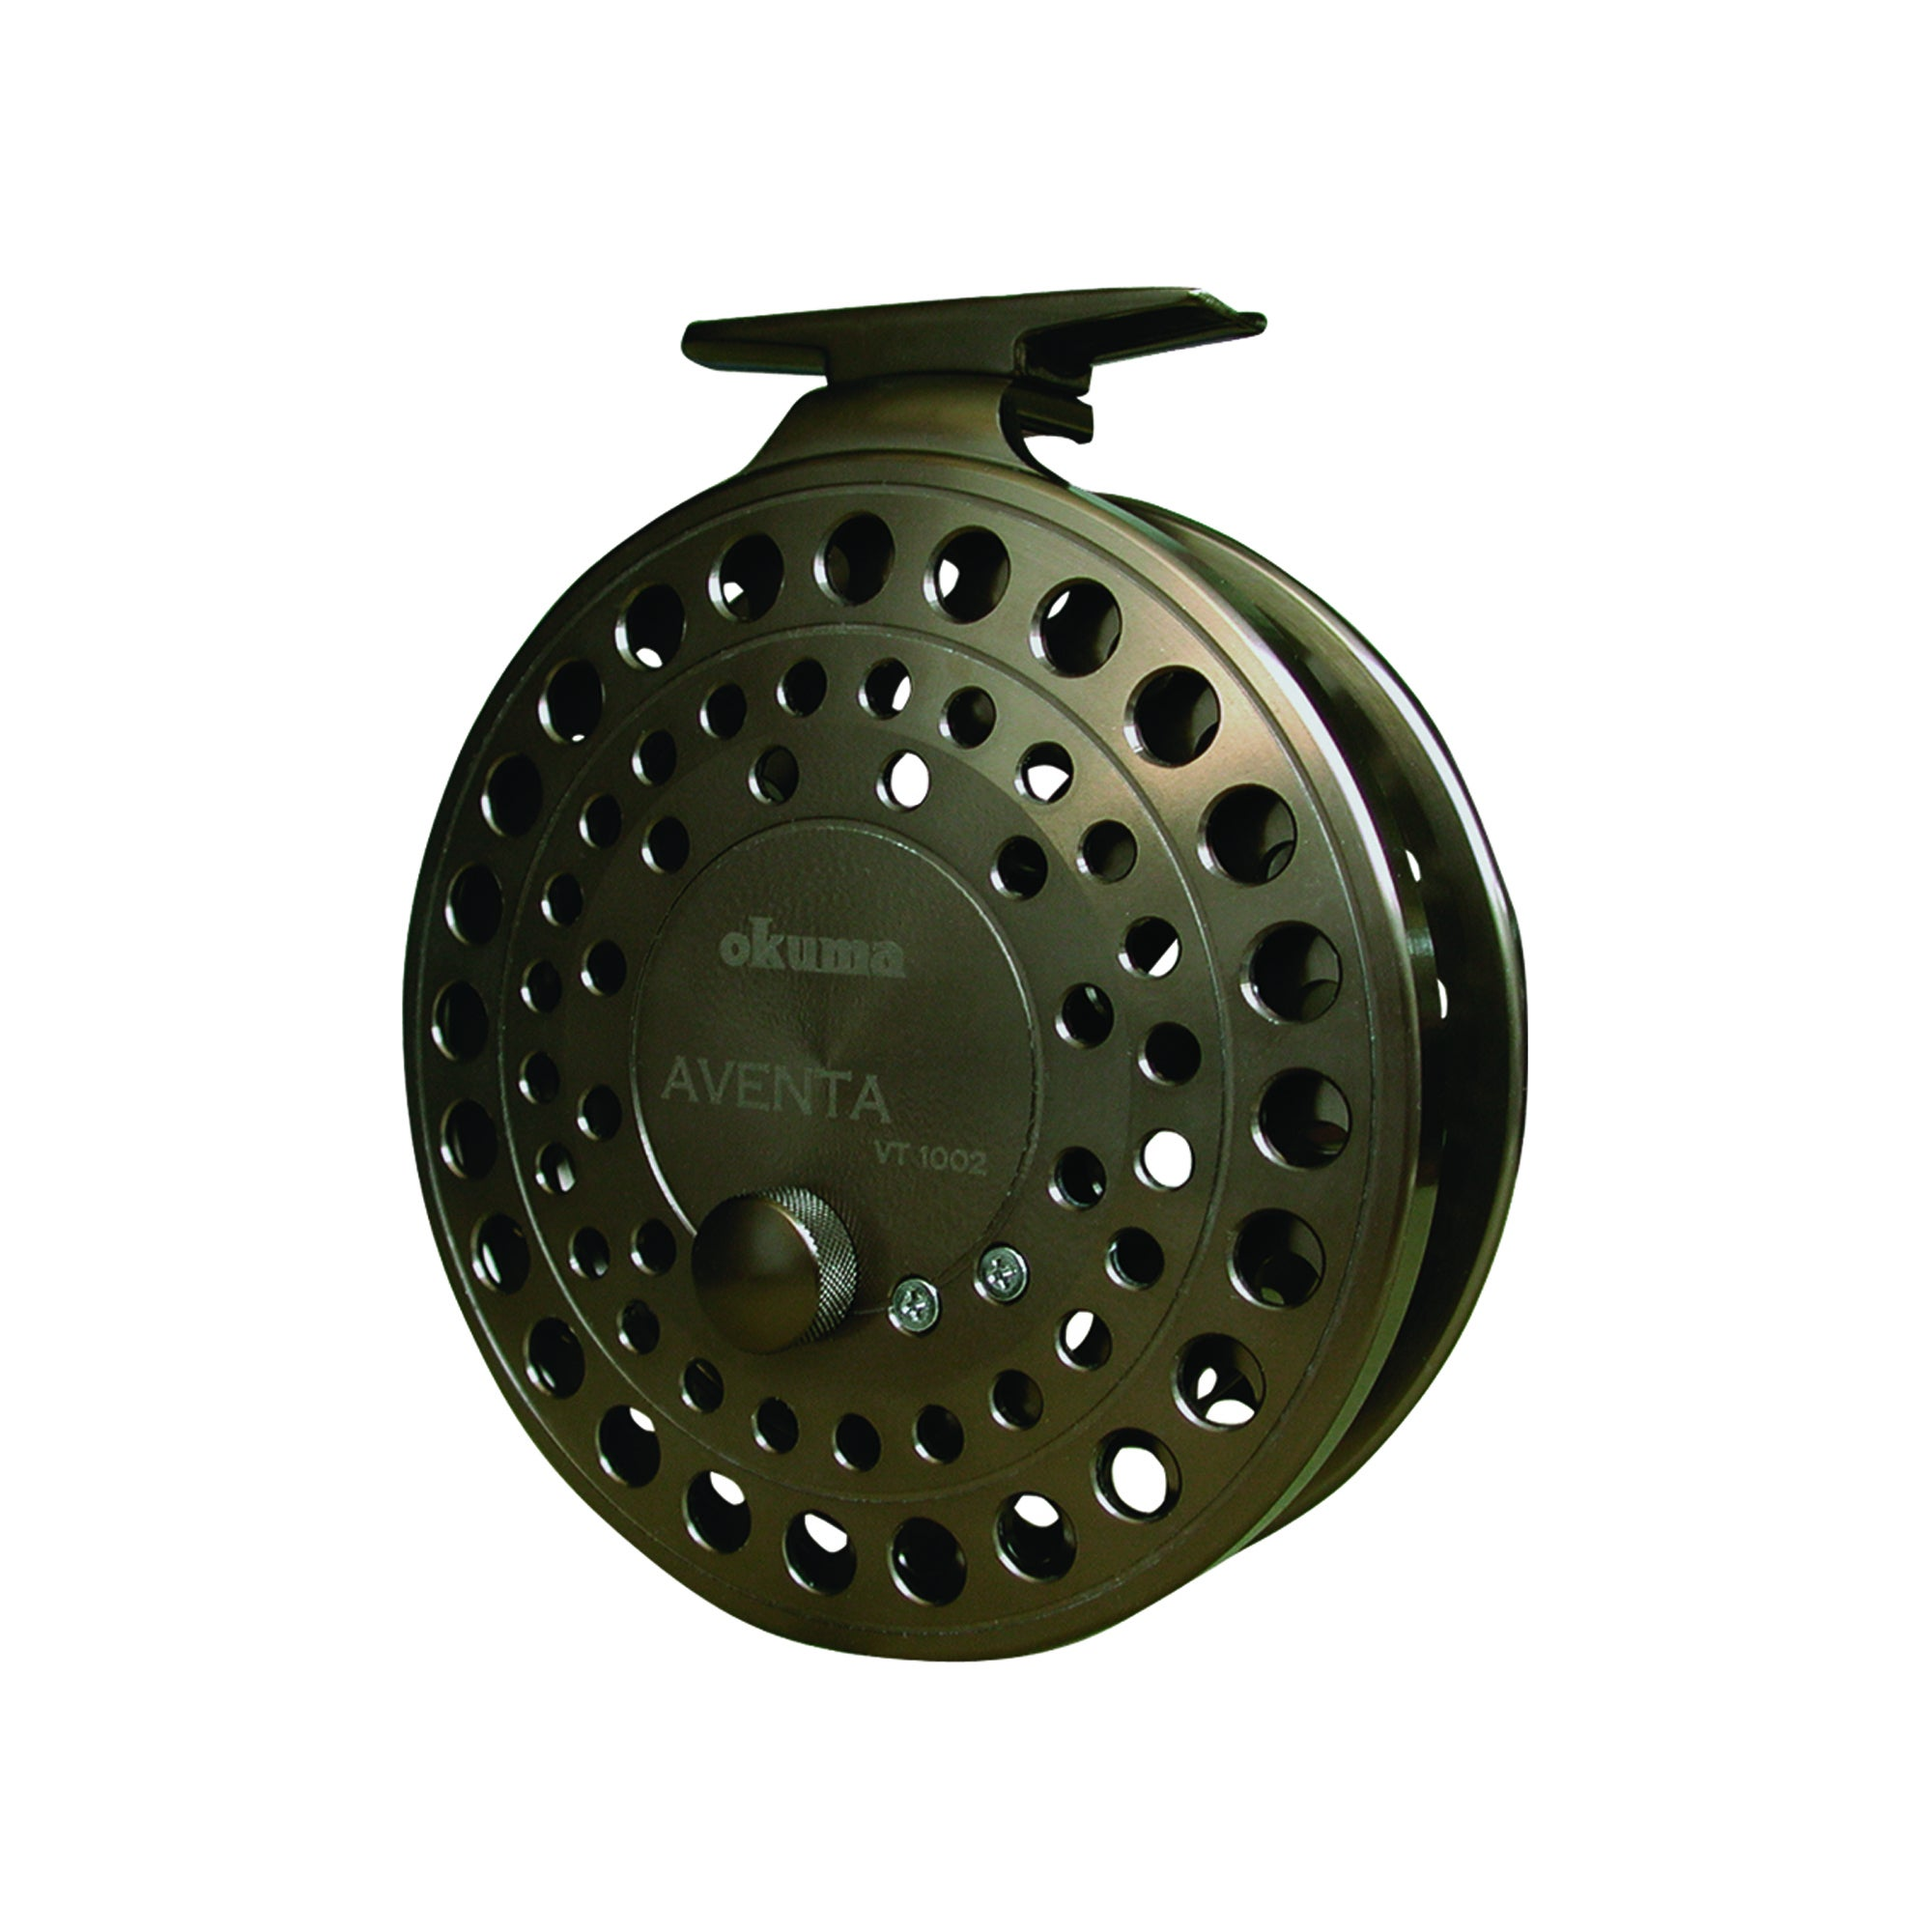 "Aventa Float Reel 13-inch 2BB (13"", bronze) thumbnail"